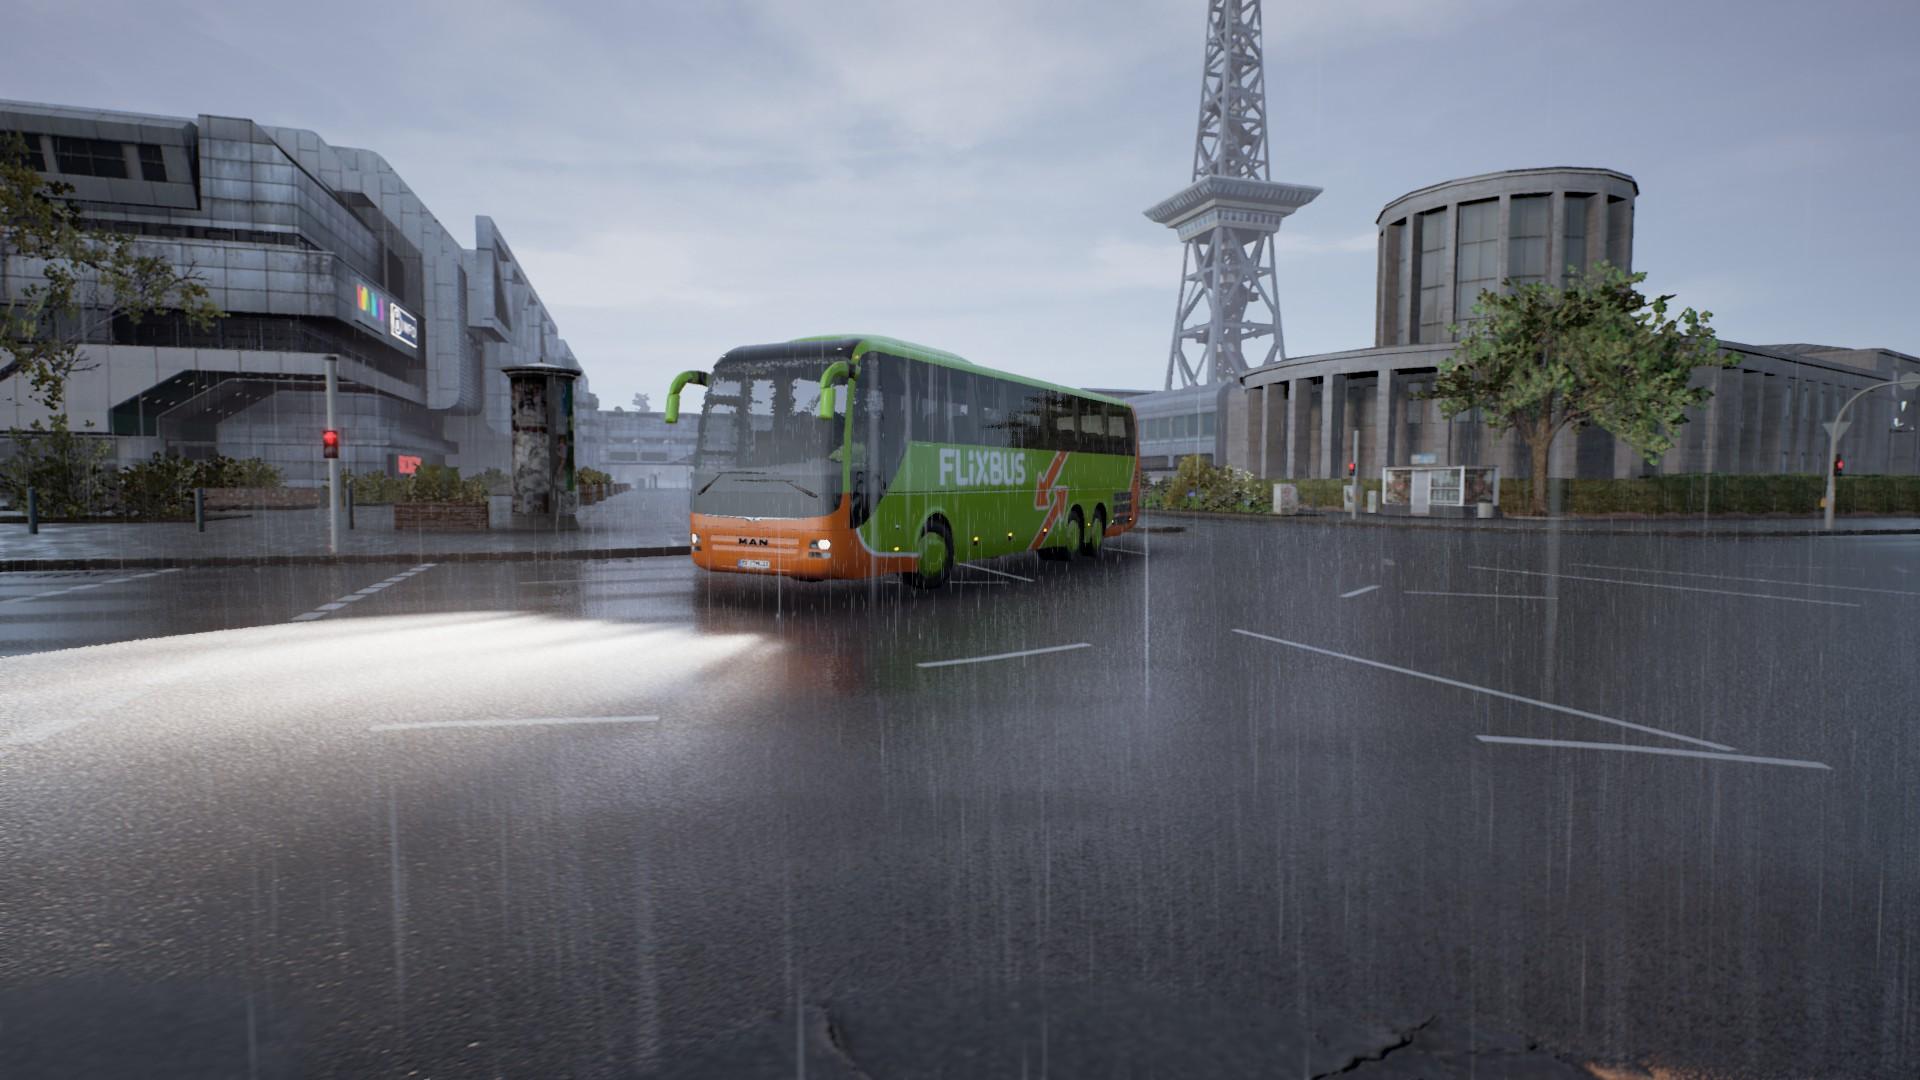 fernbus simulator download free no key